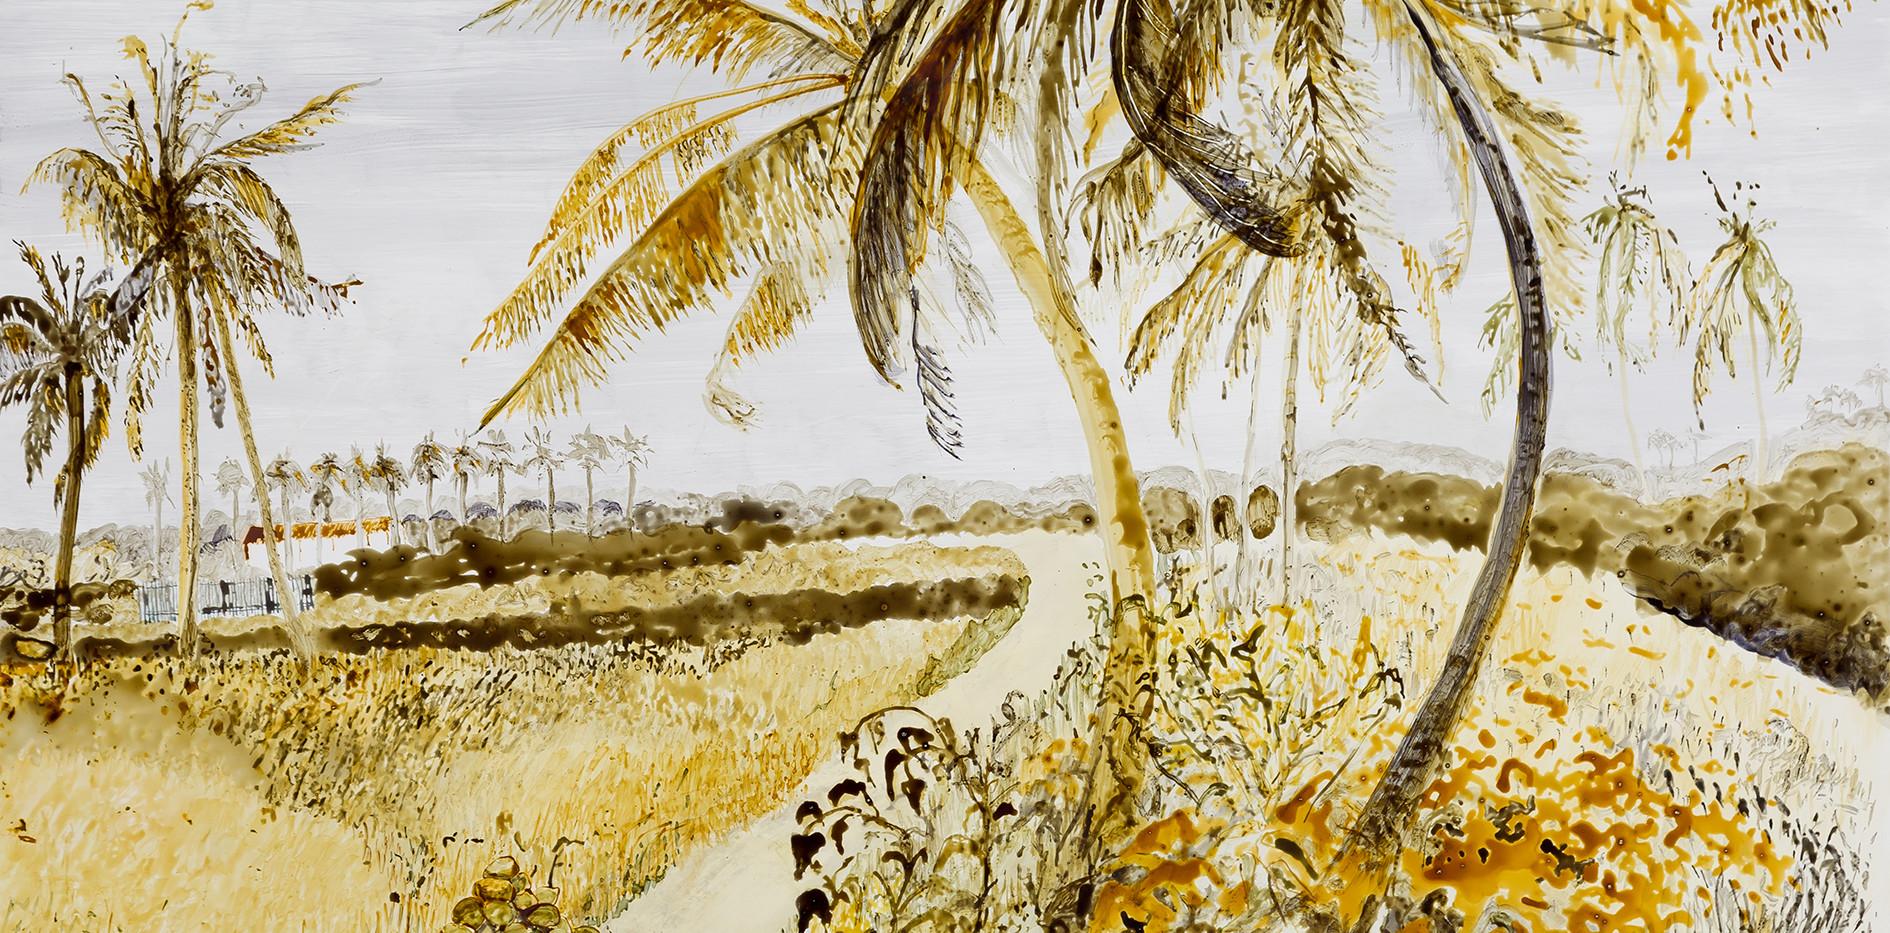 Avenue of coconuts web.jpg